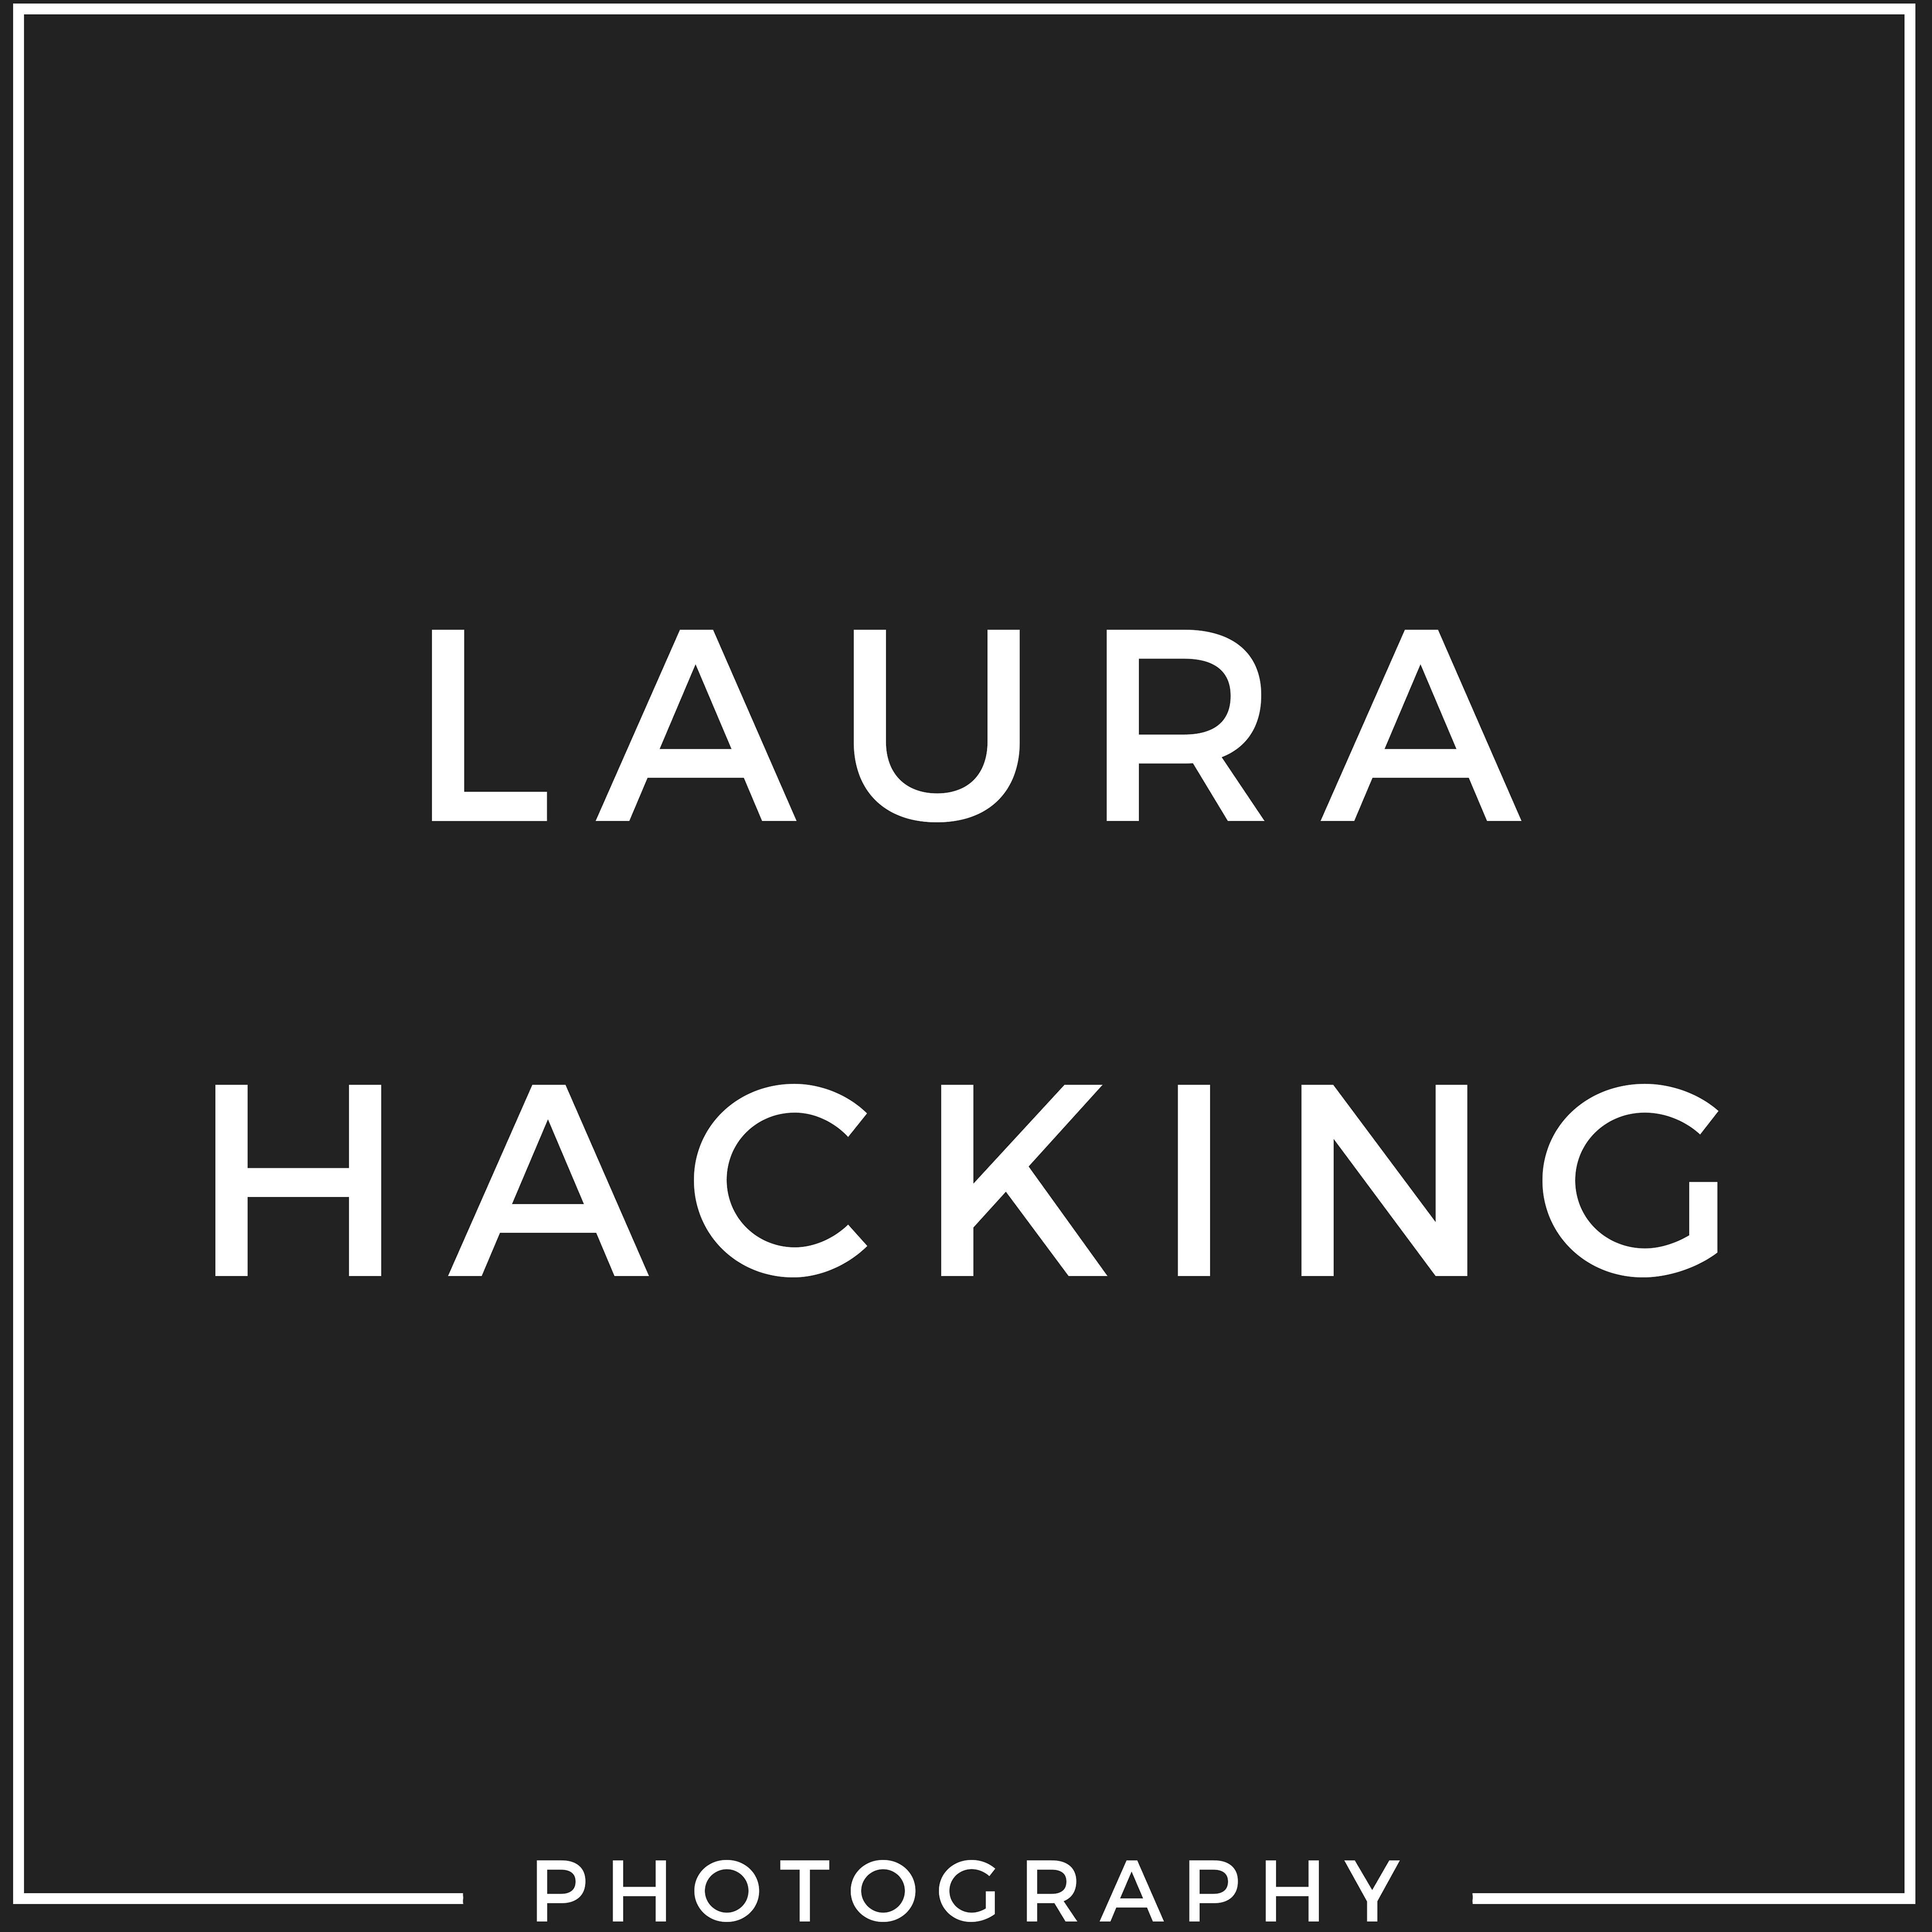 Laura Hacking